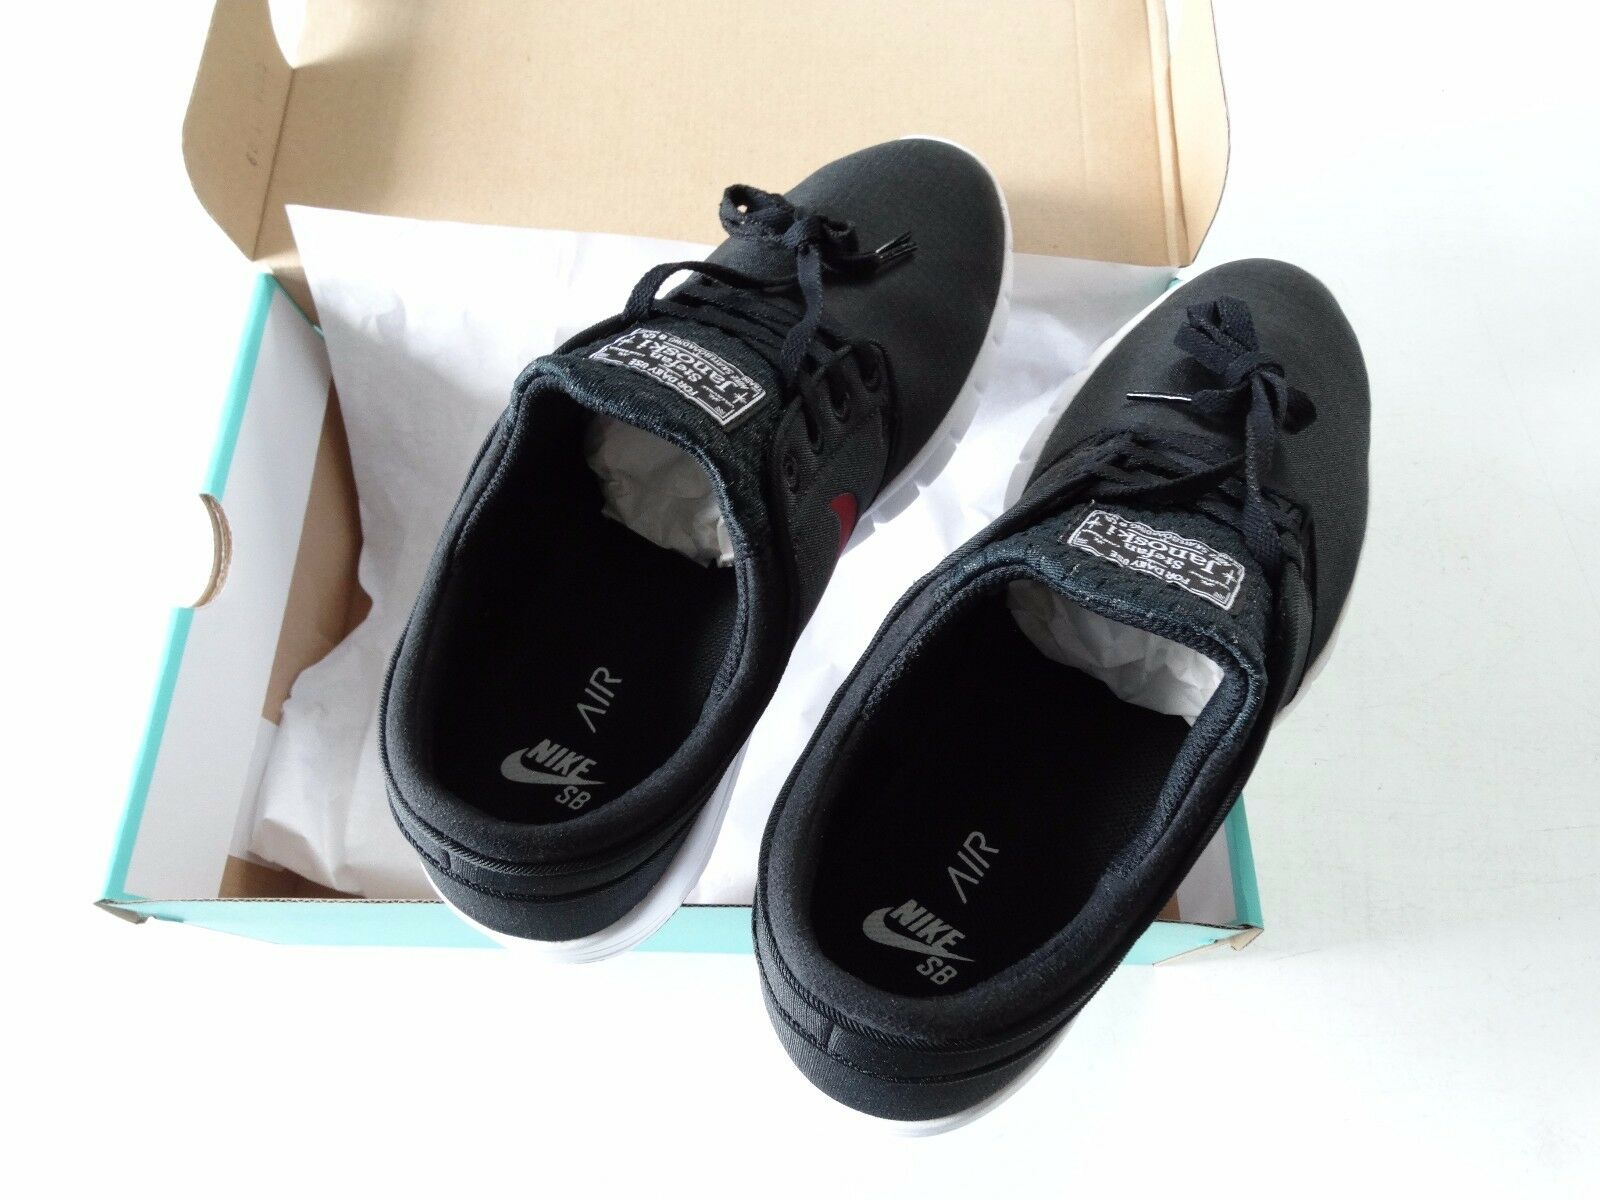 Nike SB Stefan Janoski Max Mens Skateboarding Shoes Black/Team Red White Size 11